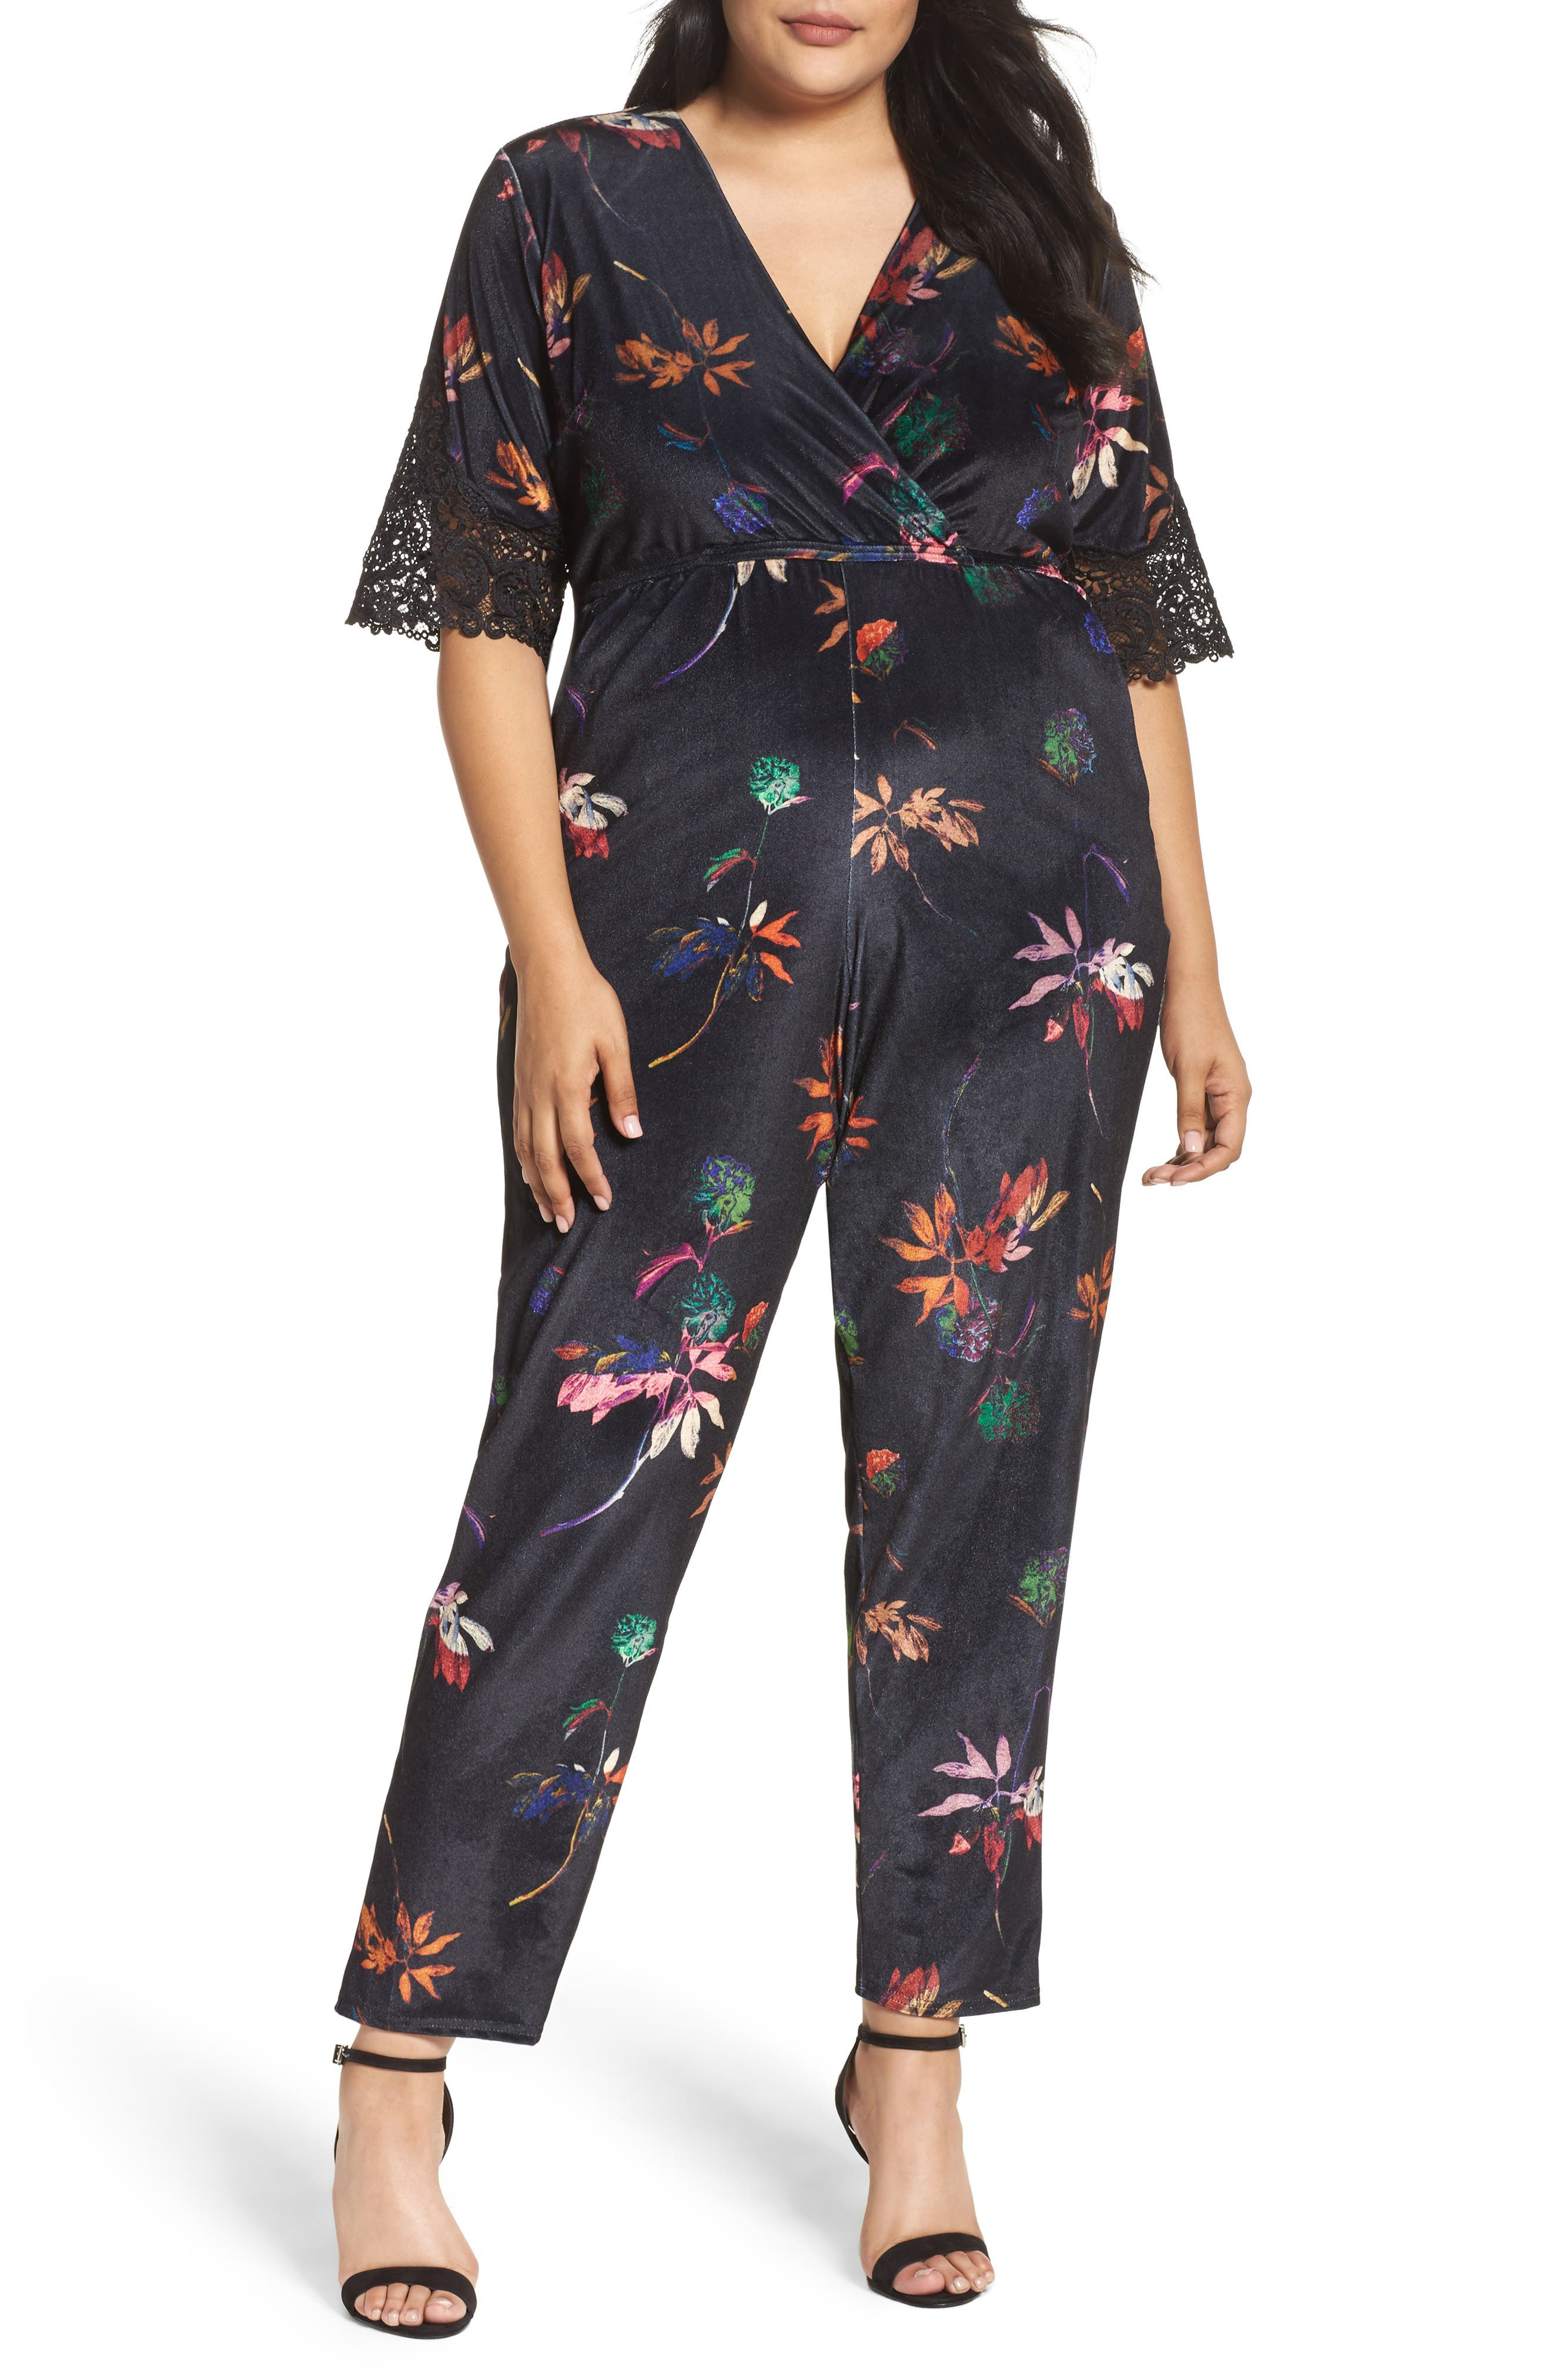 Alternate Image 1 Selected - LOST INK Velvet Floral Jumpsuit (Plus Size)